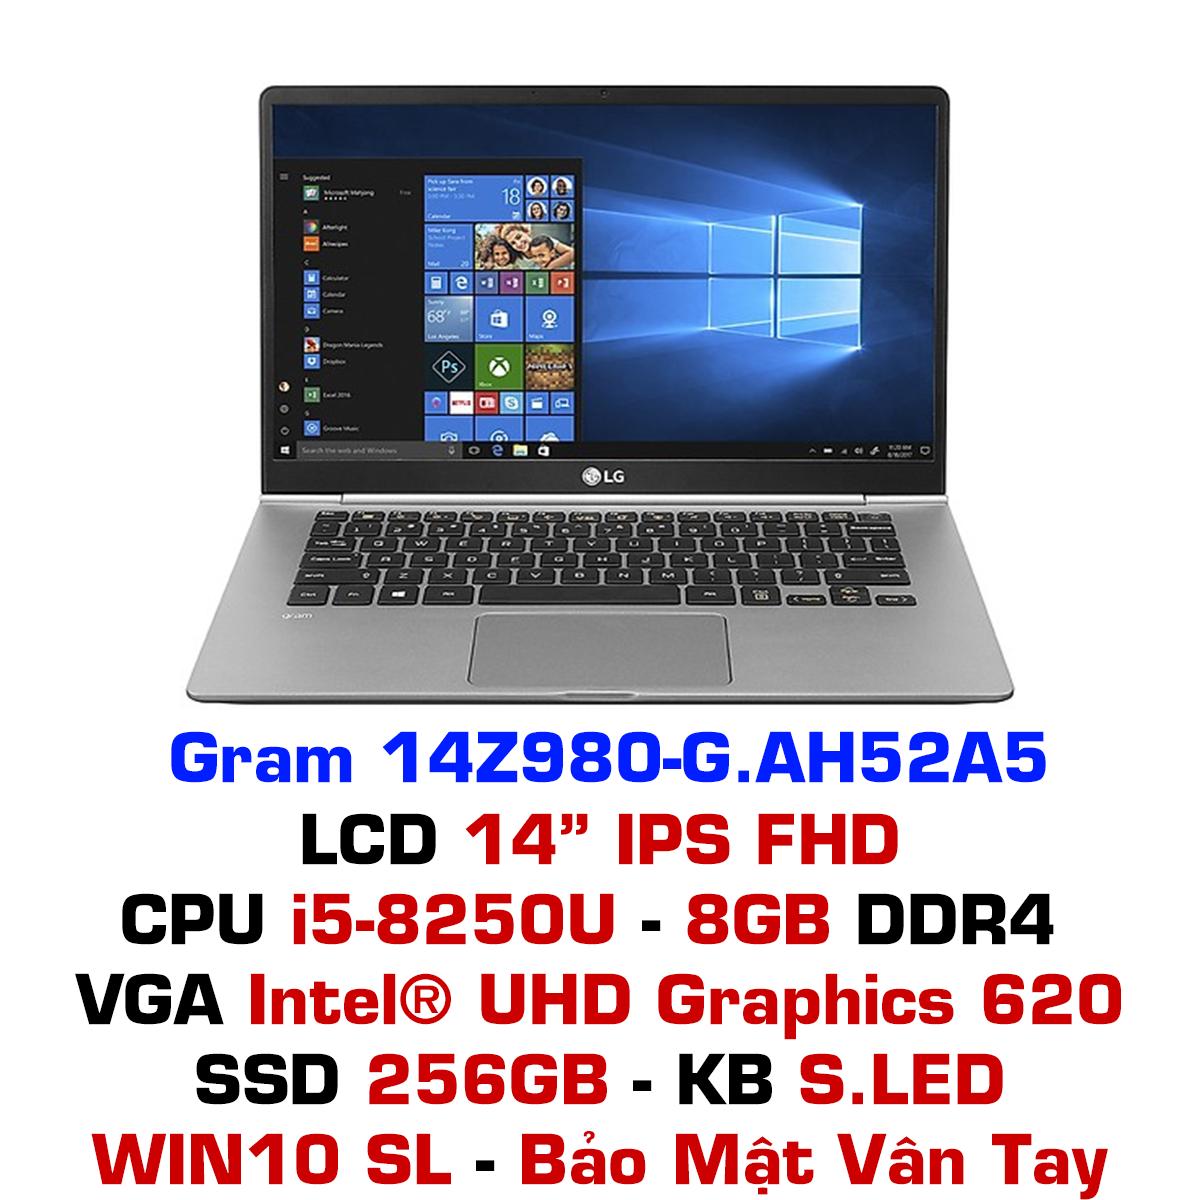 Laptop LG Gram 2018 14Z980-G.AH52A5